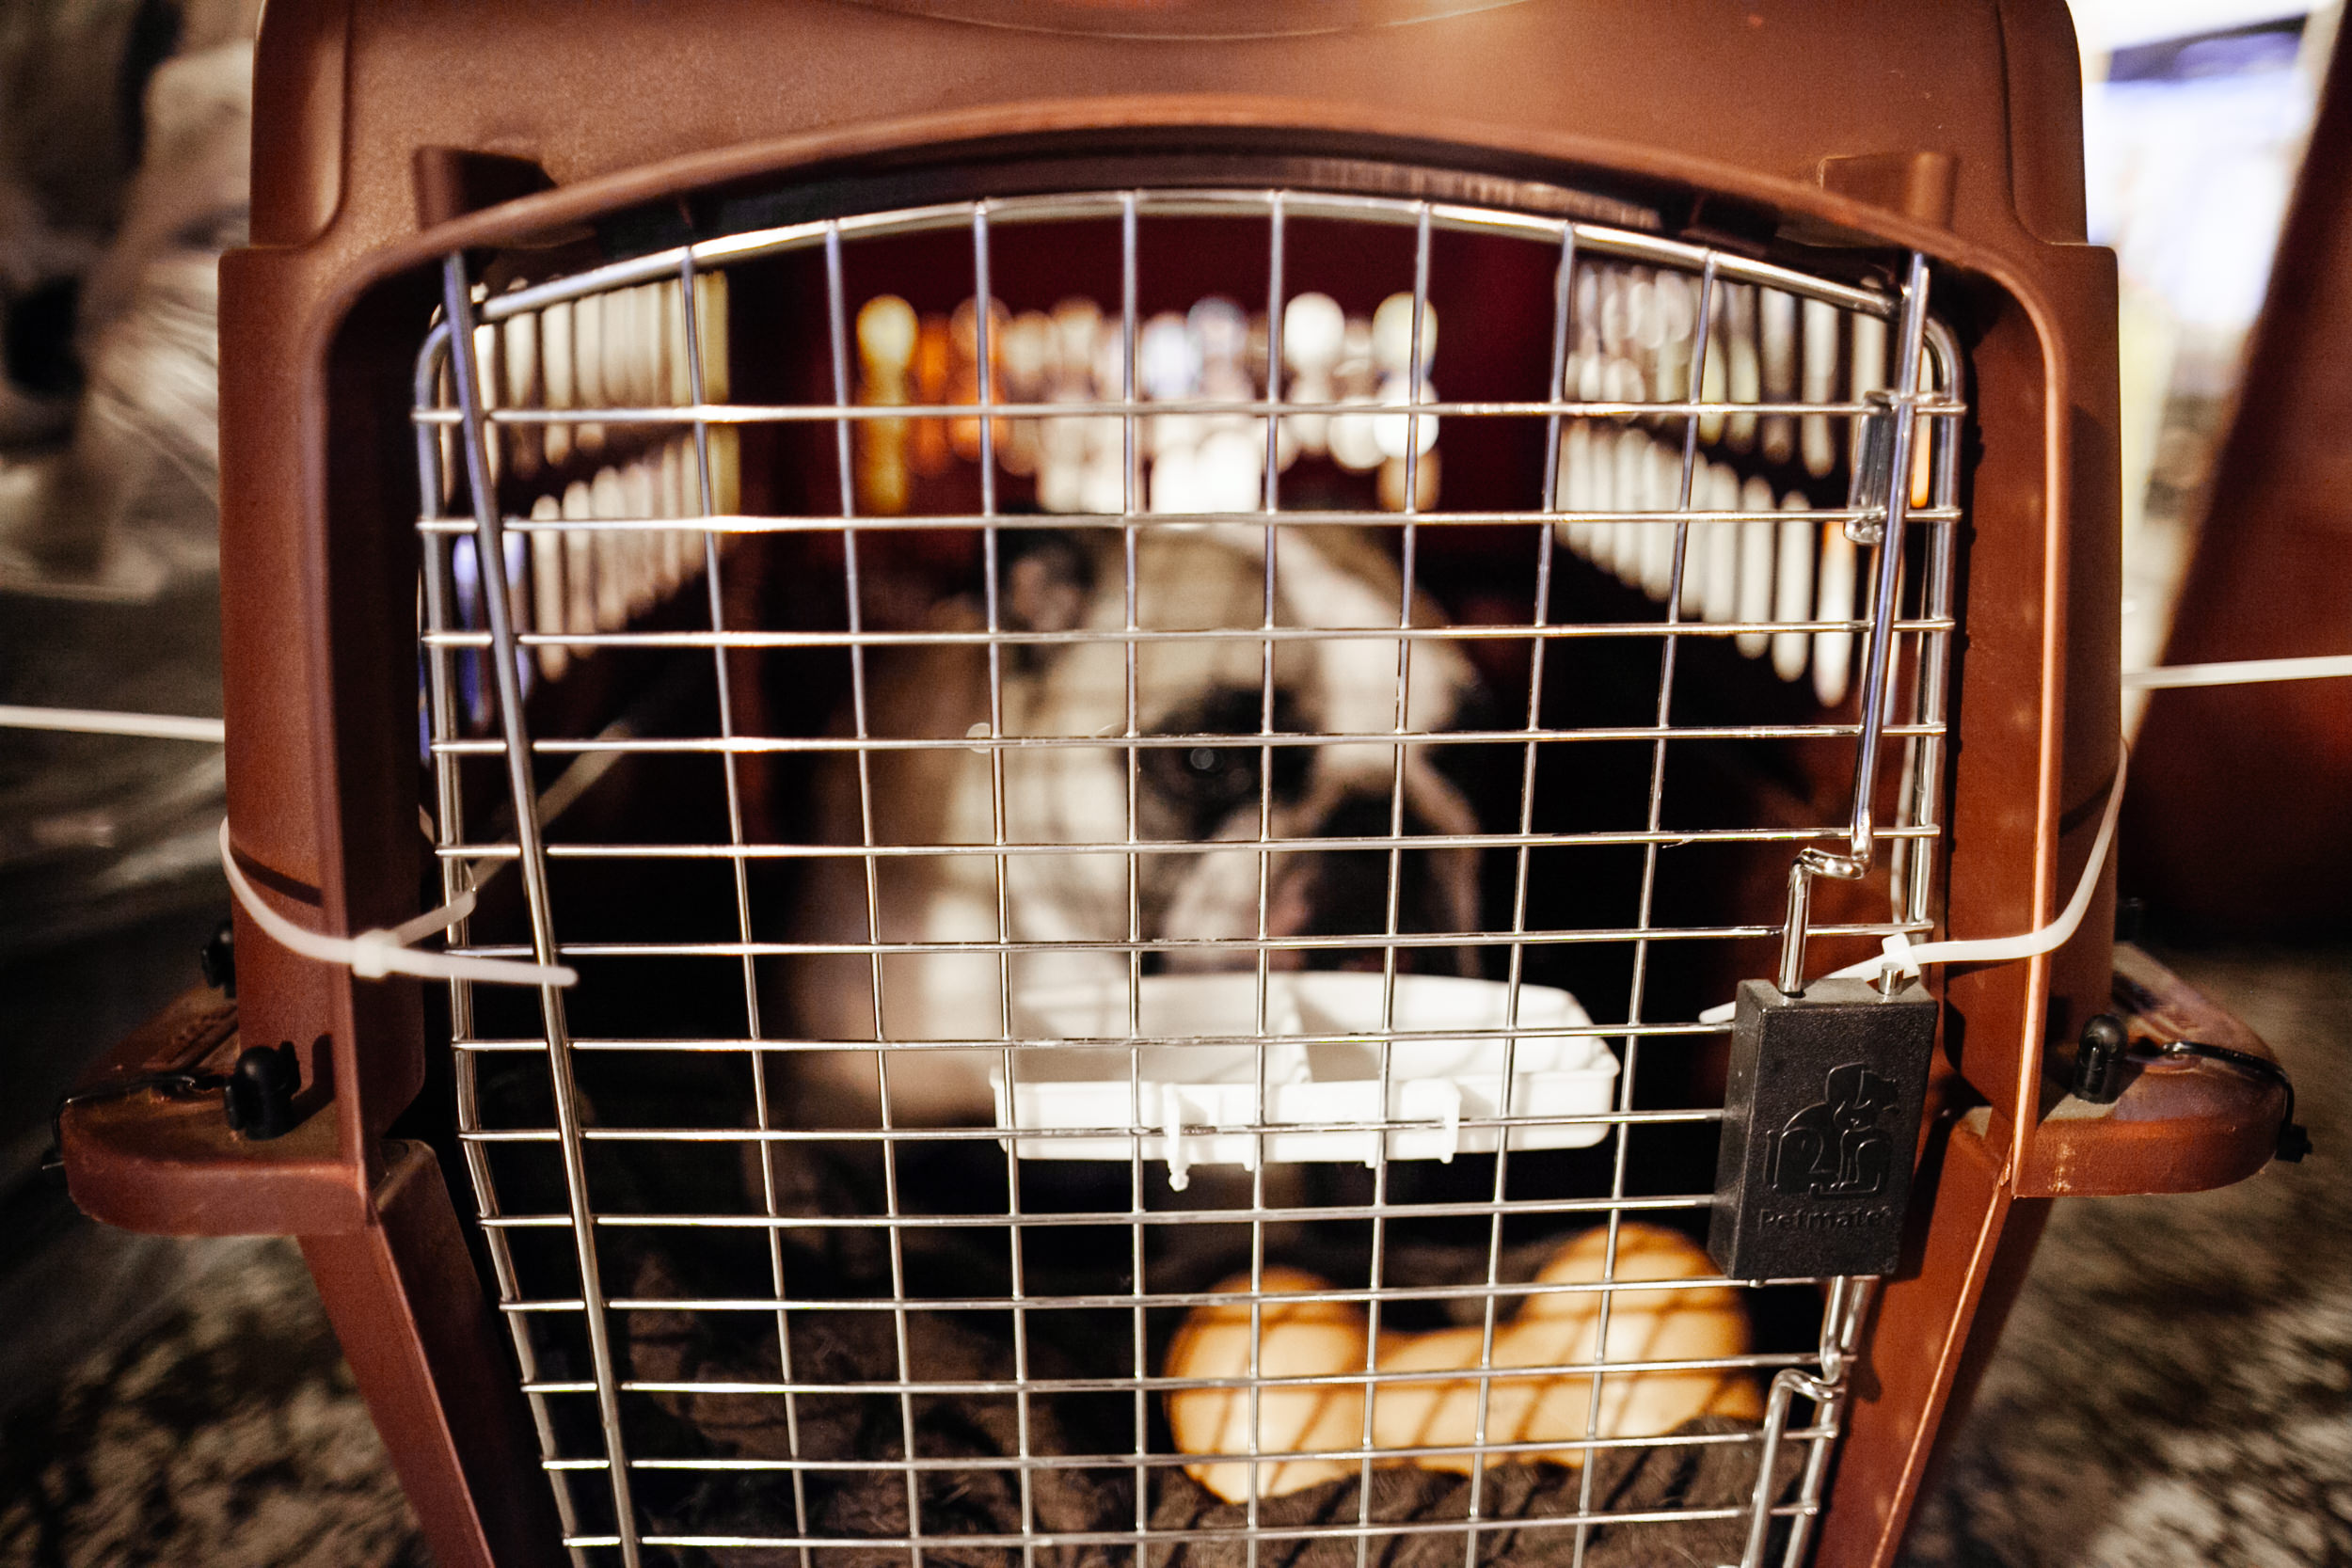 shlomi-amiga-dogs-in-cages-8.jpg